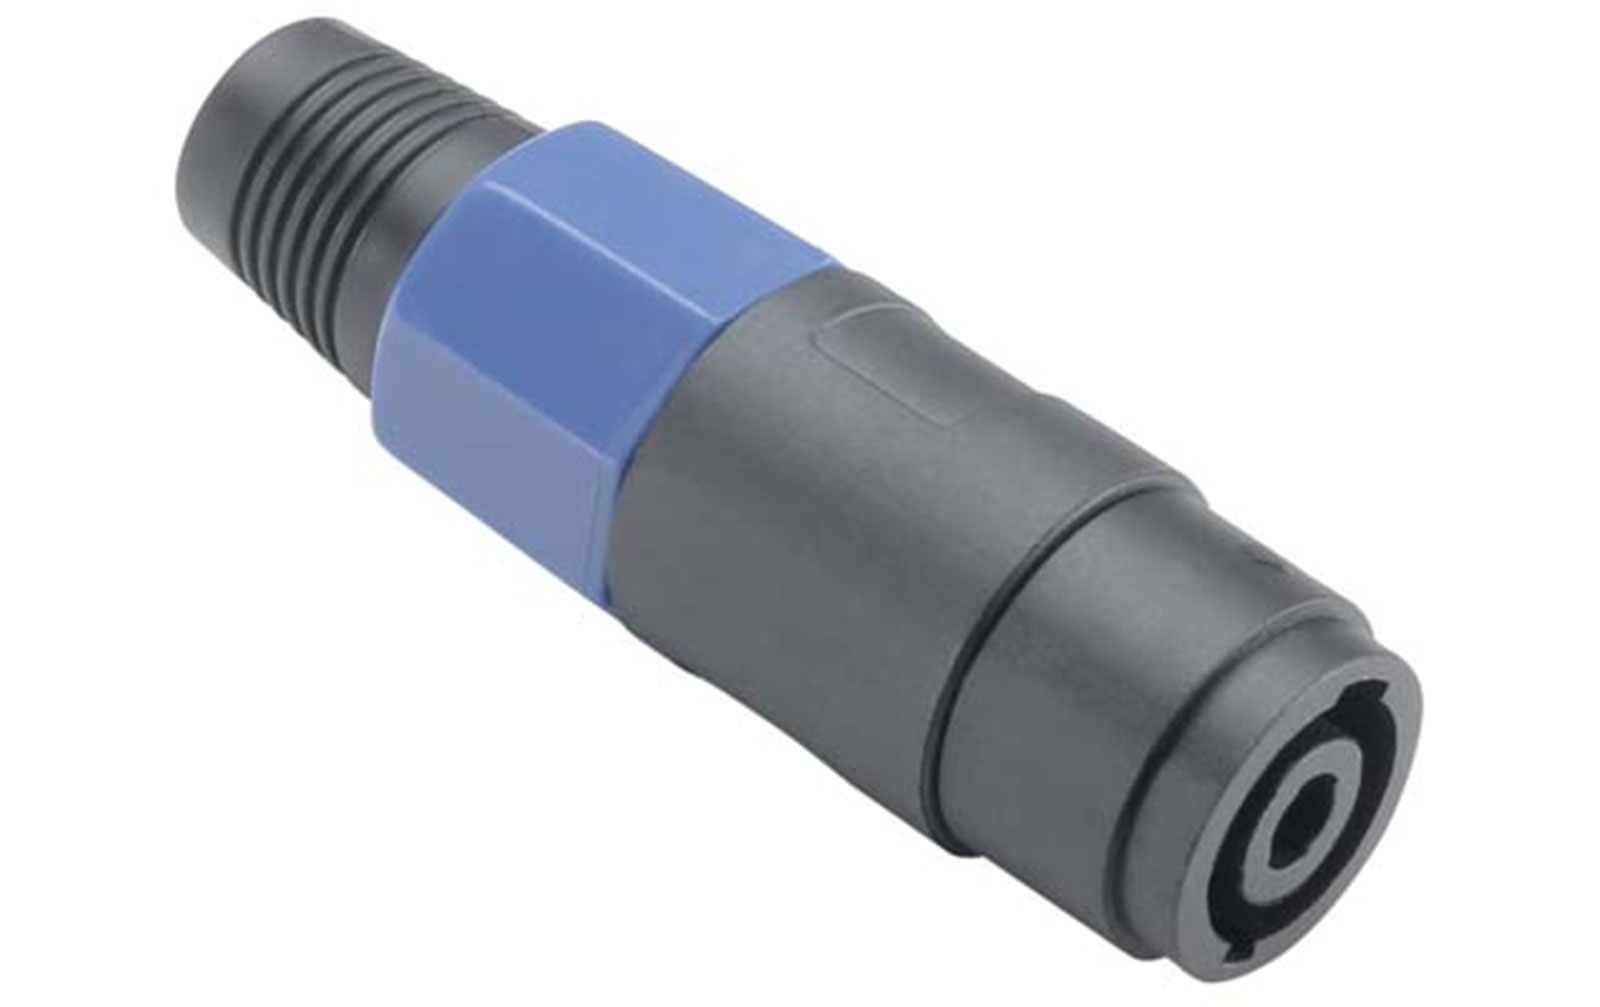 adam-hall-7874-standard-lautsprecherverbinder-4-pol